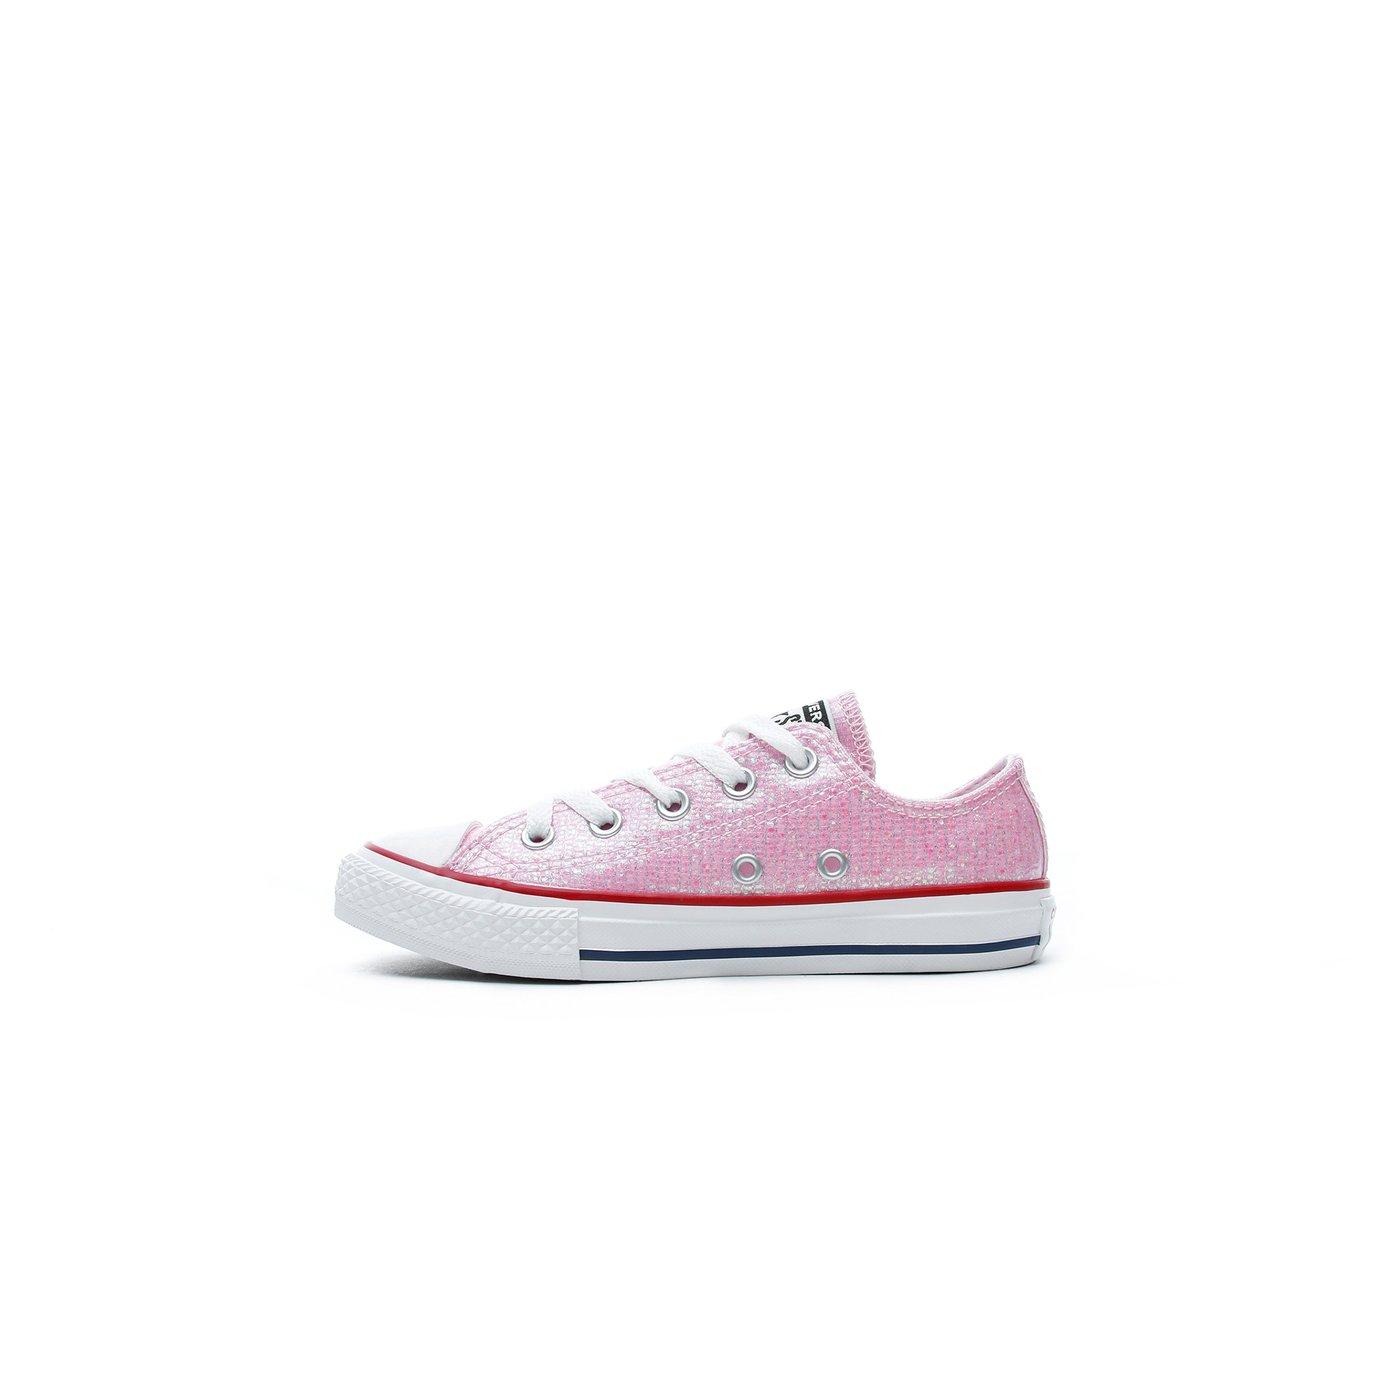 Converse Chuck Taylor All Star Sparkle Çocuk Pembe Sneaker